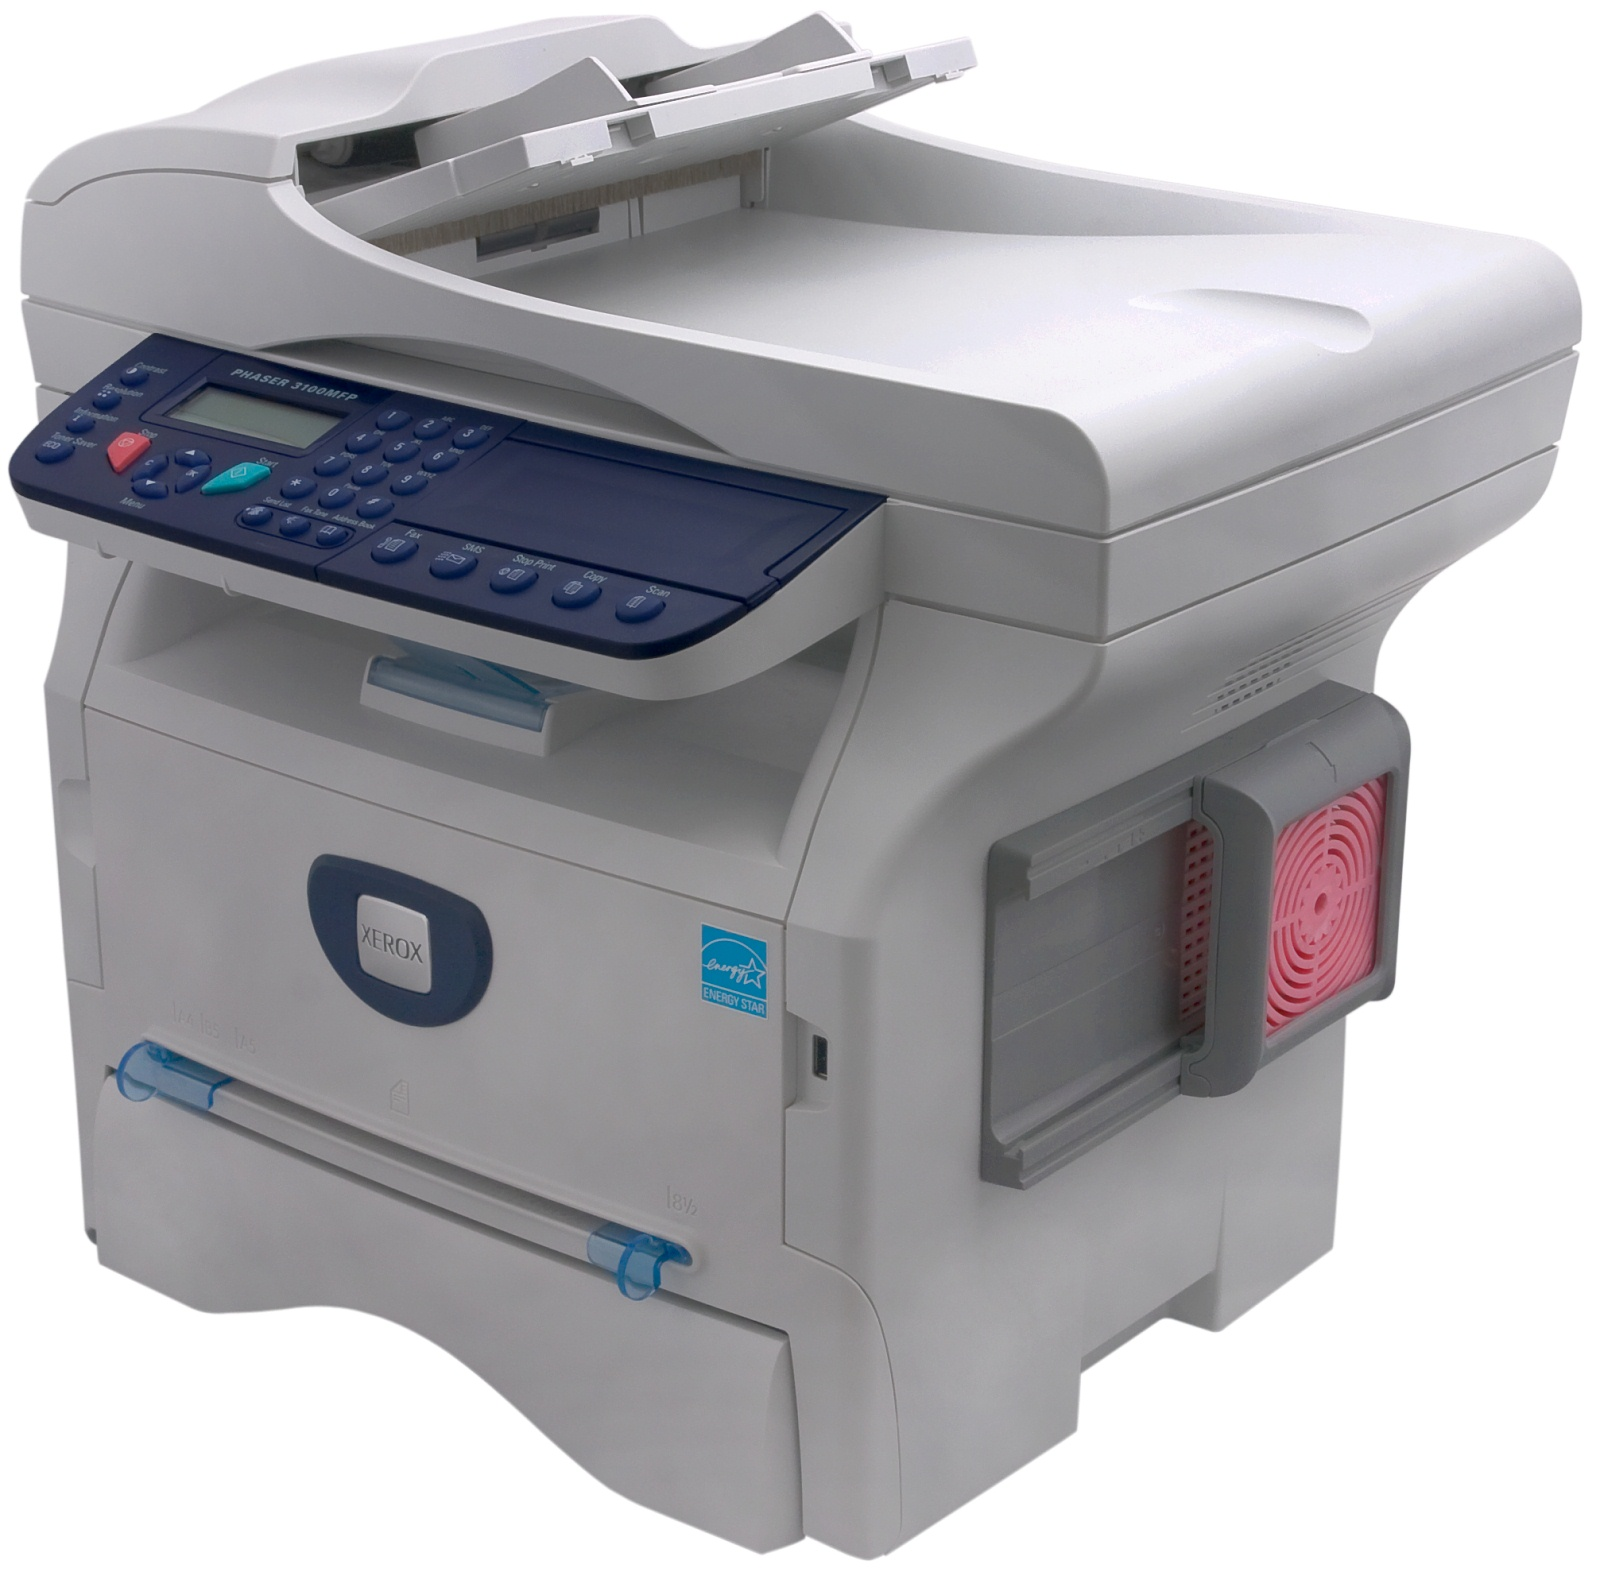 Biroja tehnika Printeri (Lāzera, Tintes, Multi, u.c)